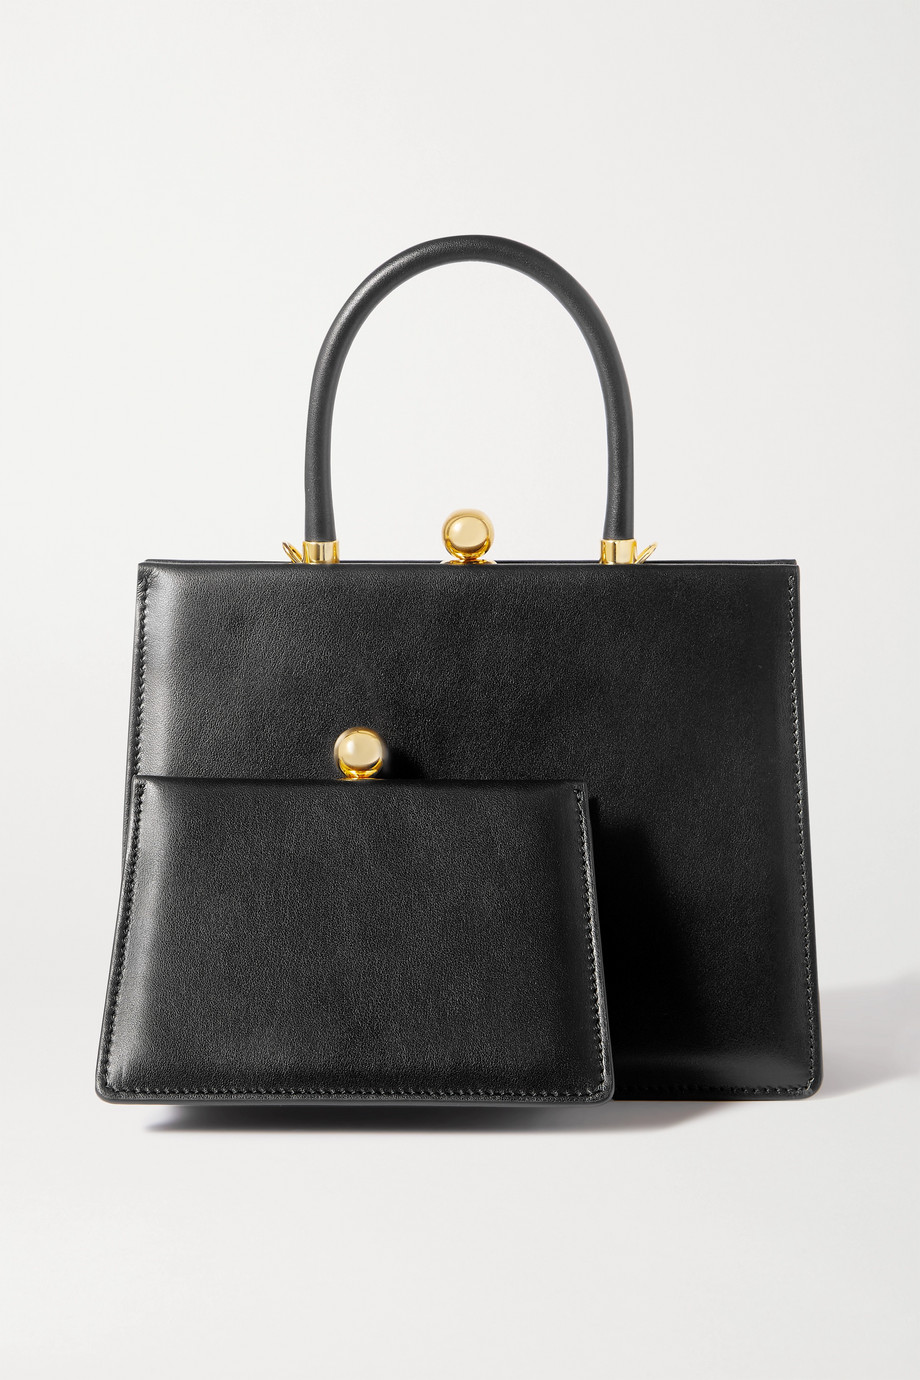 Ratio et Motus Twin Frame leather tote